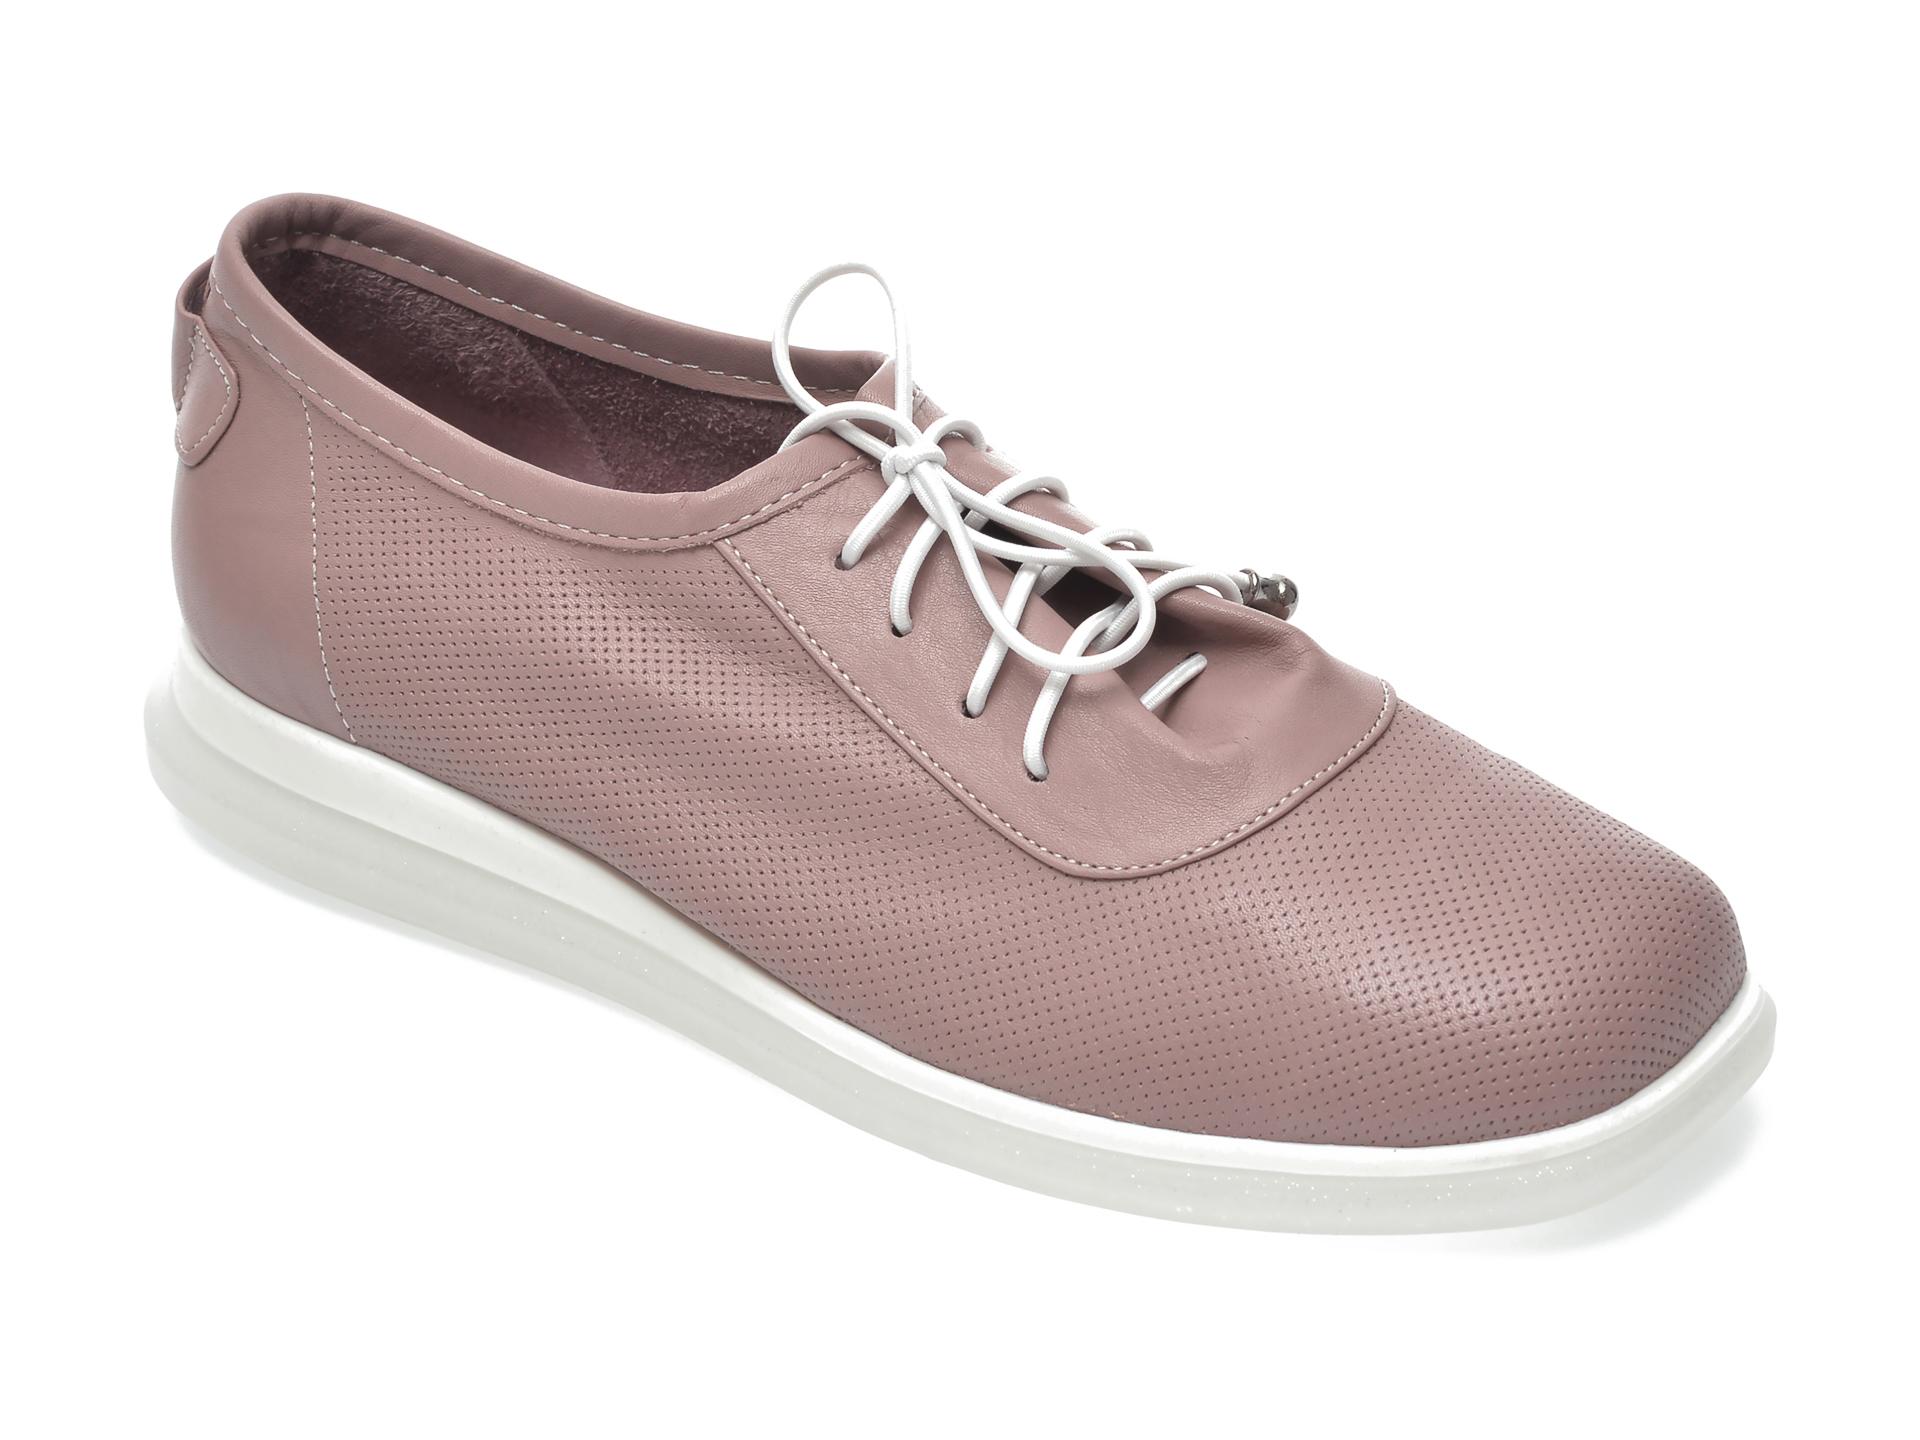 Pantofi FLAVIA PASSINI roz, 1252701, din piele naturala imagine otter.ro